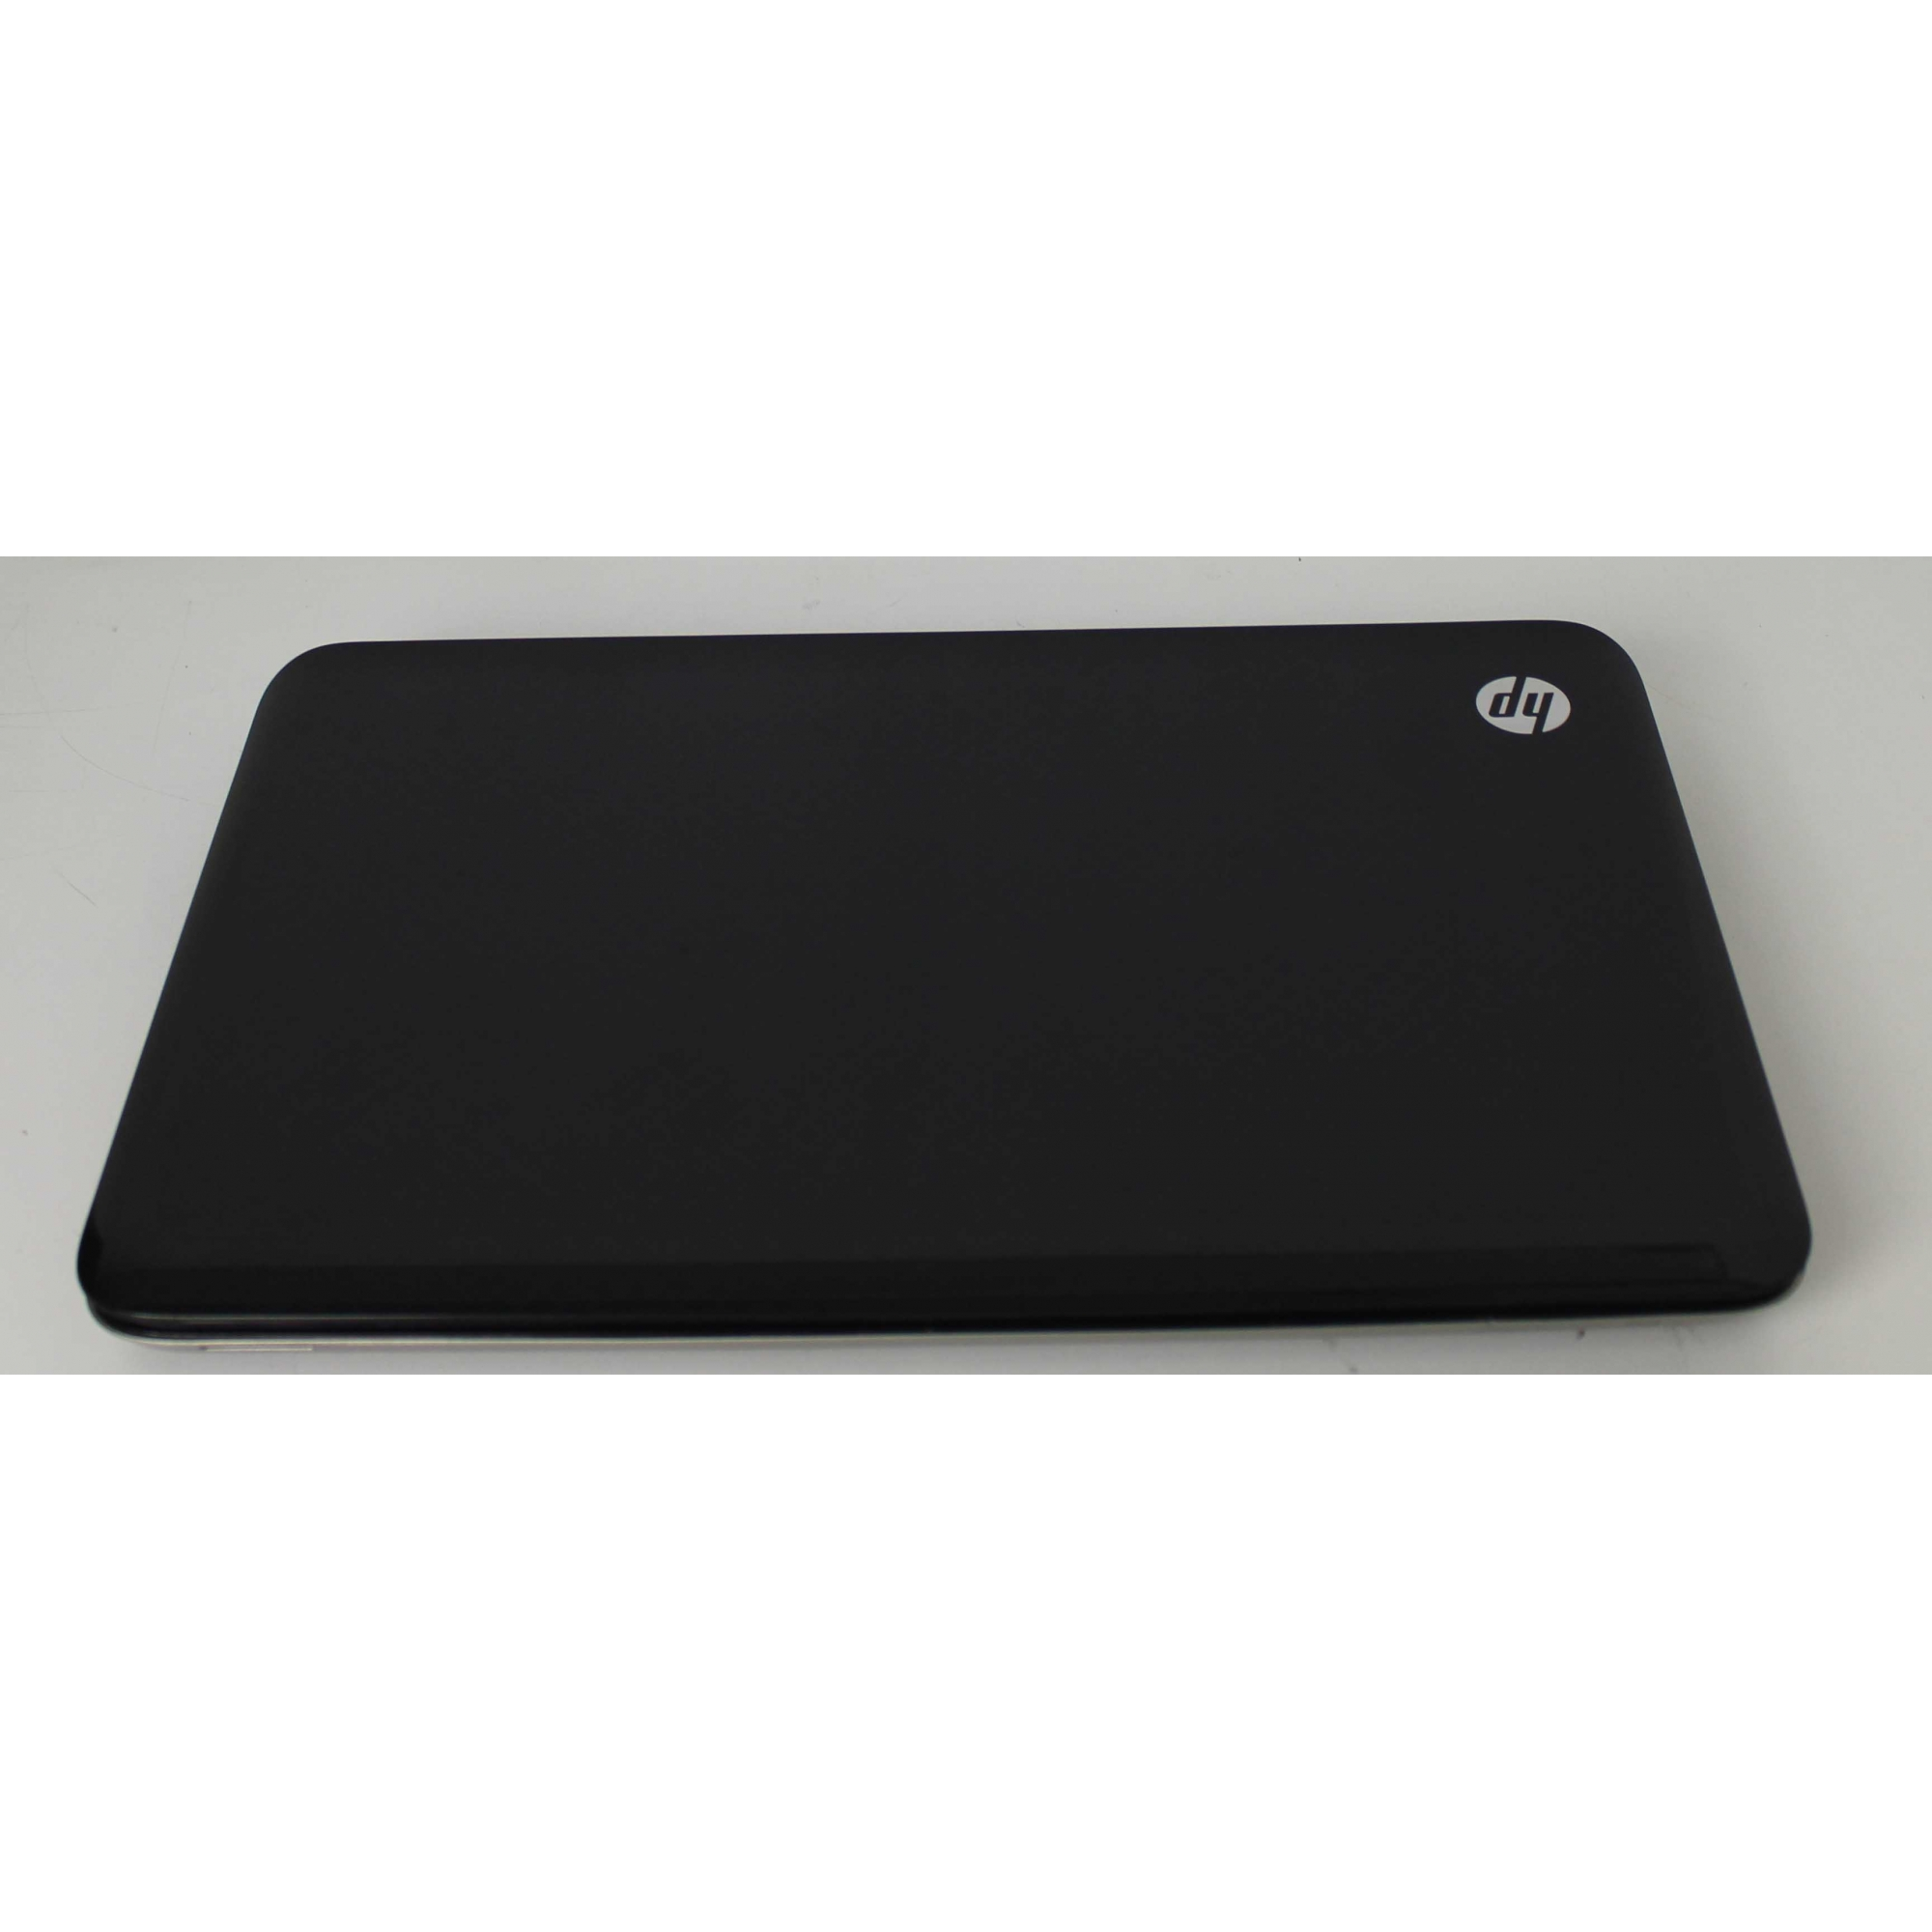 "Notebook HP Pavilion DV6-6C30BR 15.6"" AMD A4 1.9GHz 4GB HD-500GB + Alphanumérico"